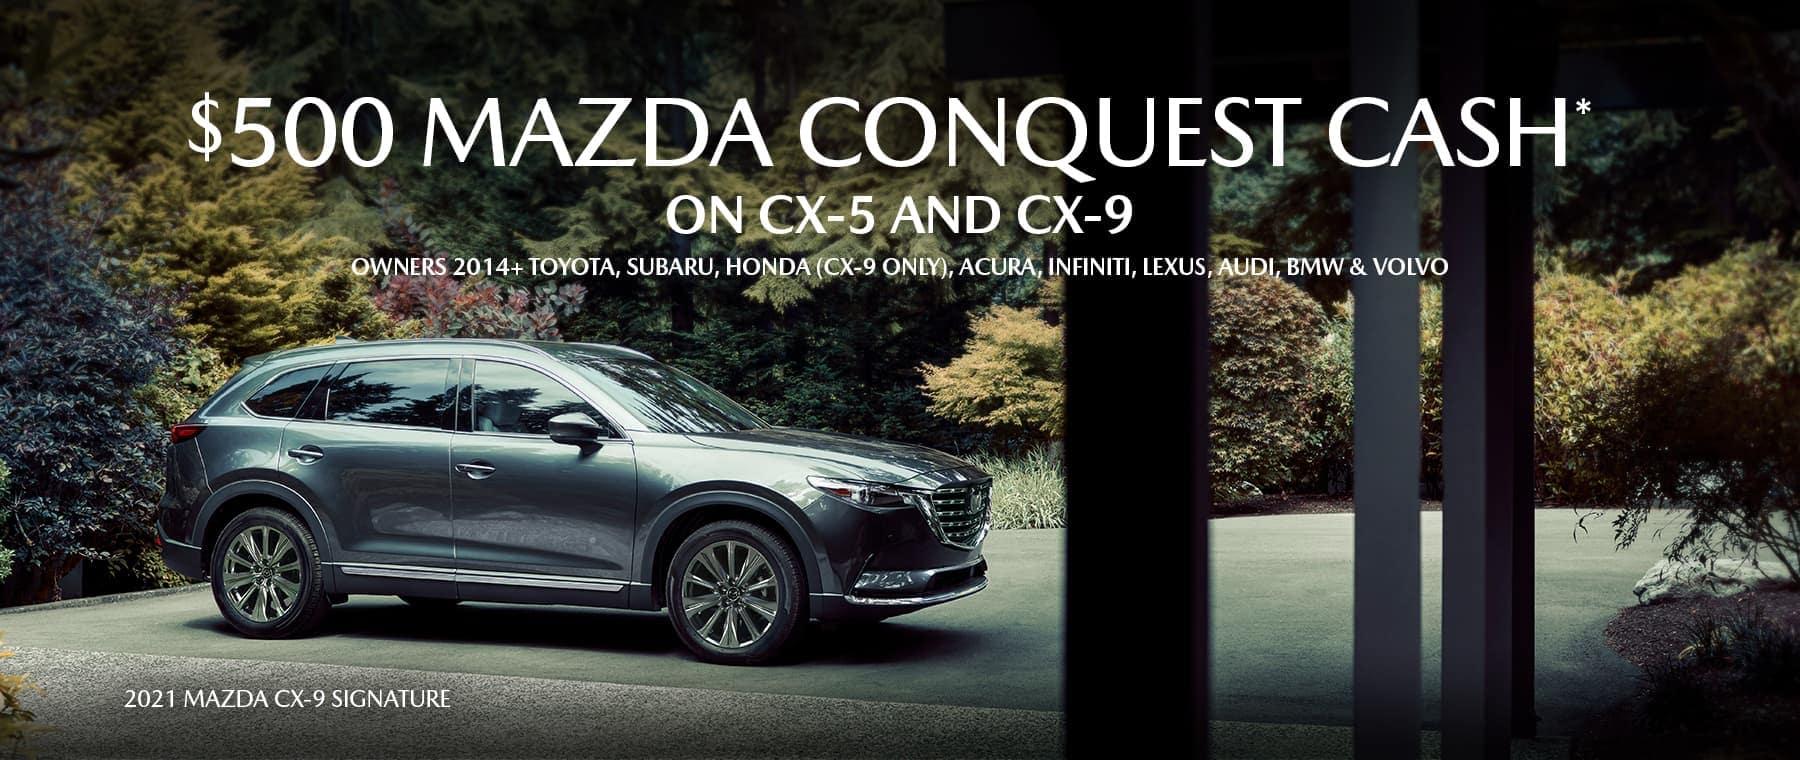 Mazda Conquest Bonss Cash Lrg